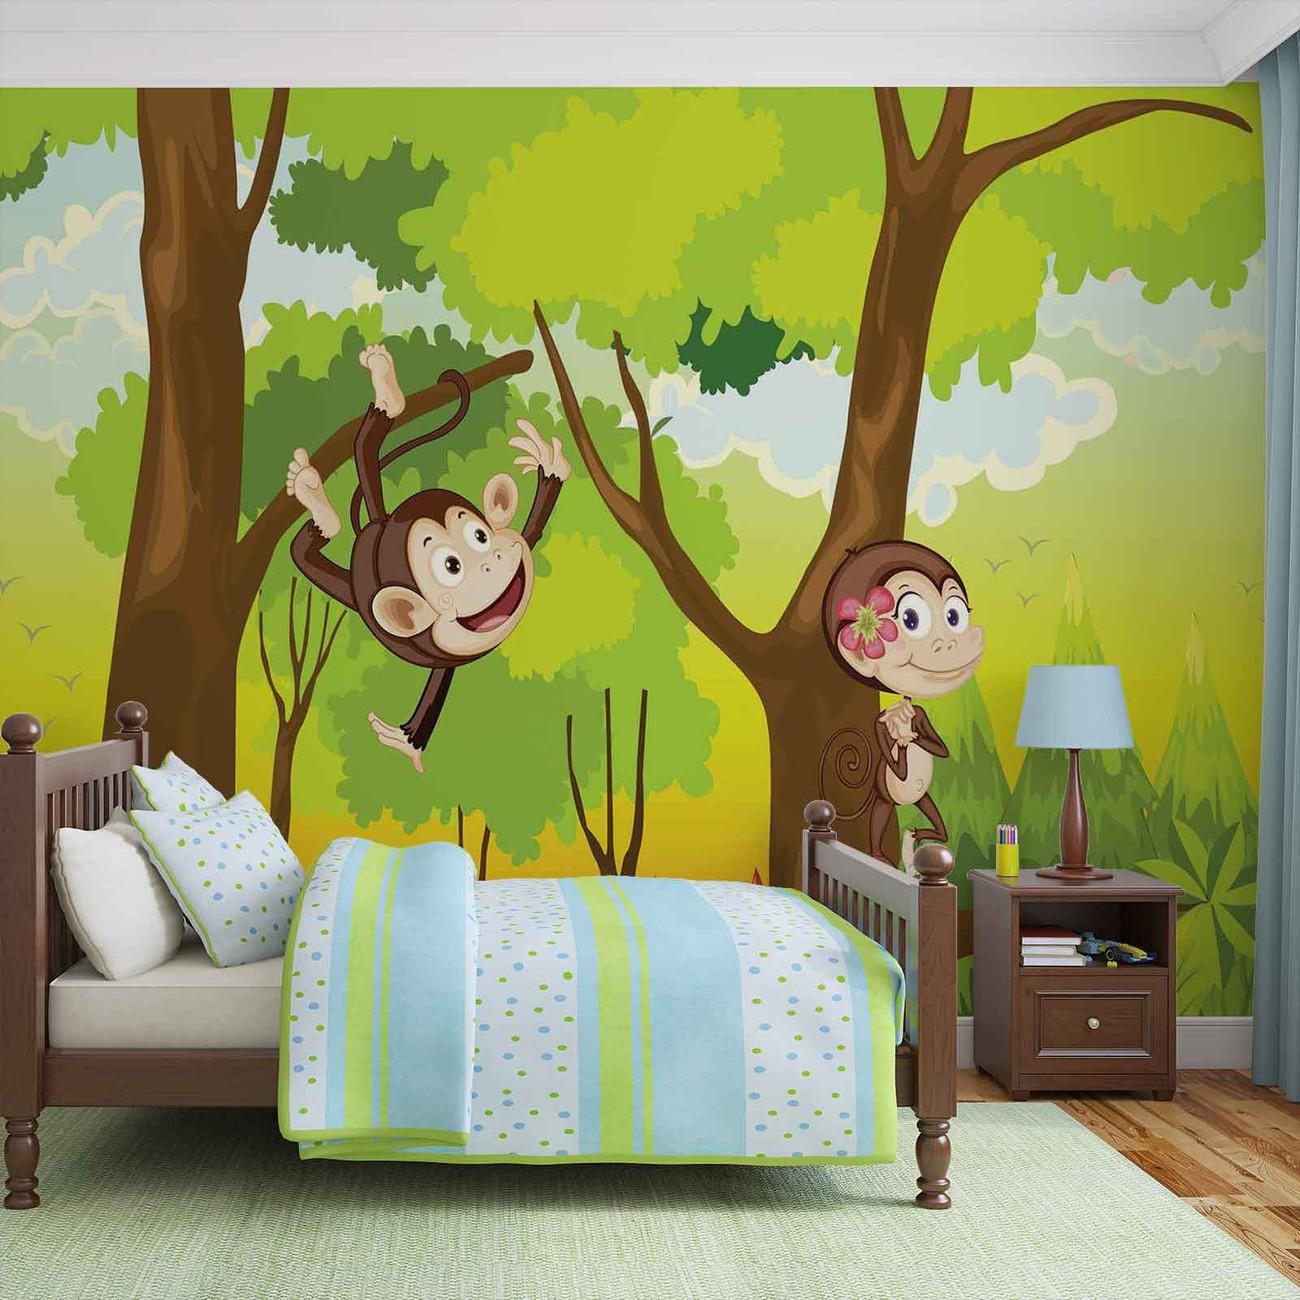 monkeys boys bedroom wall paper mural buy at europosters. Black Bedroom Furniture Sets. Home Design Ideas